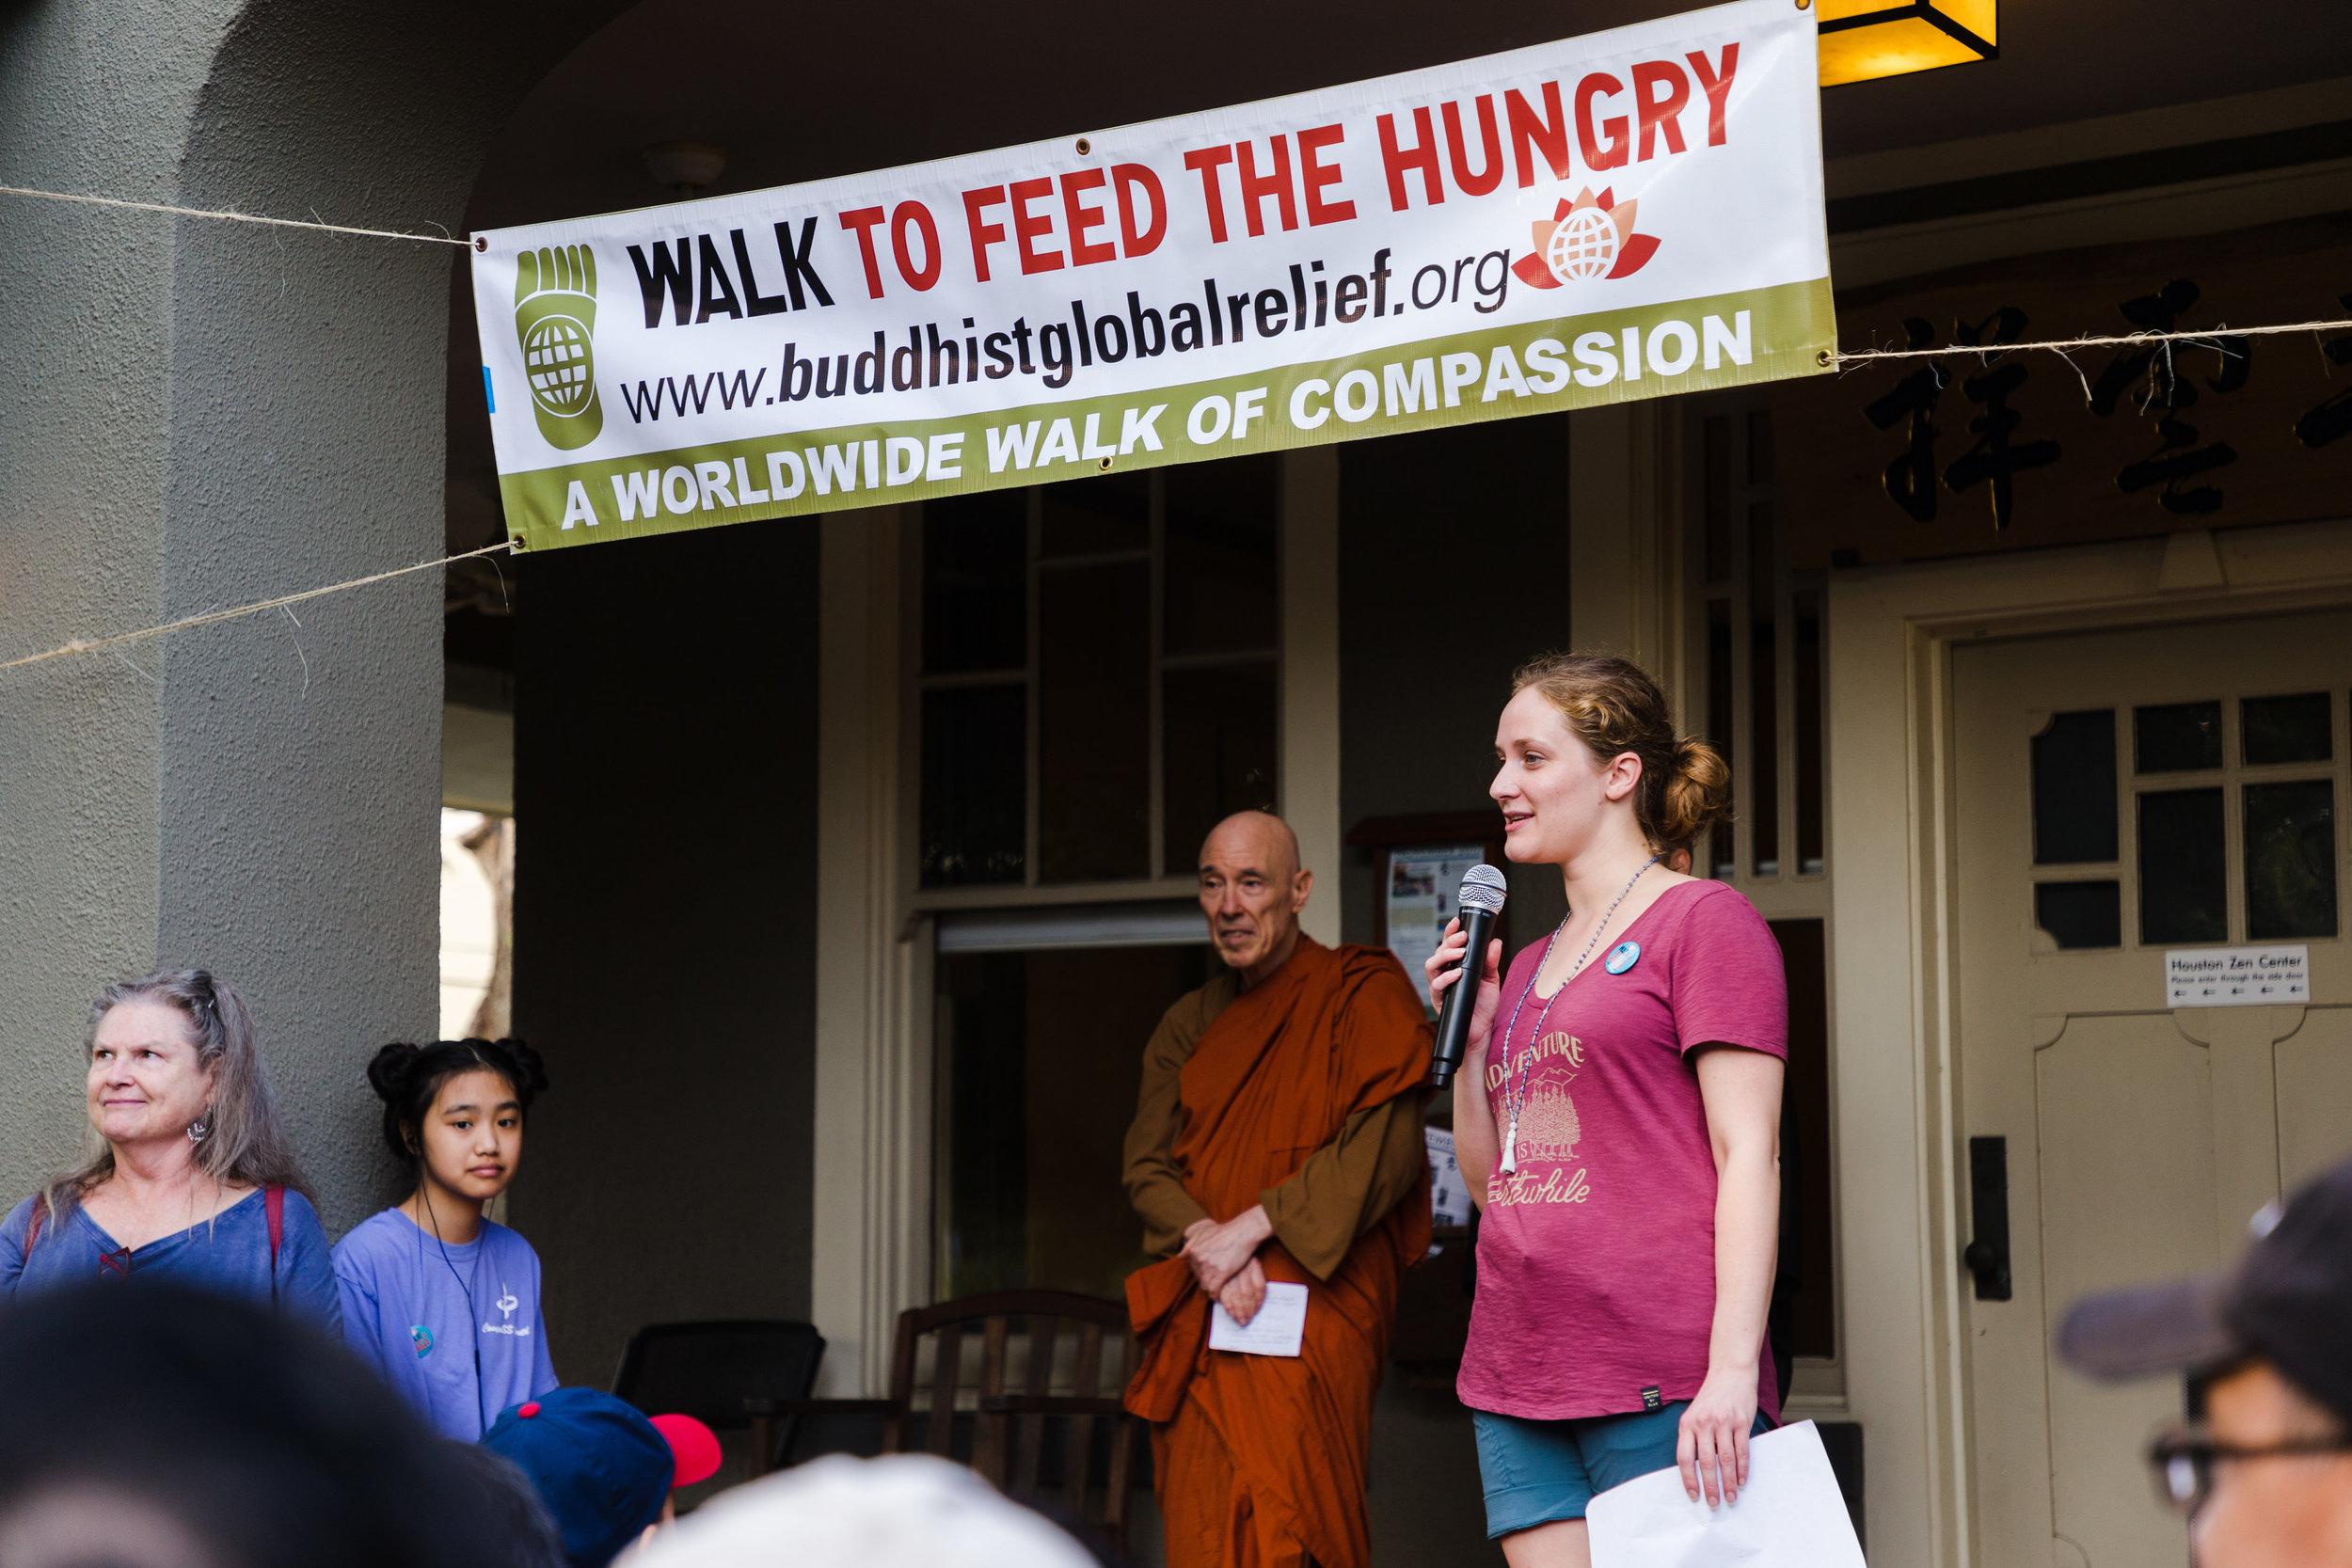 Bhikkhu-Bodhi-Global-Relief-Houston-Zen-Walk-16.jpg